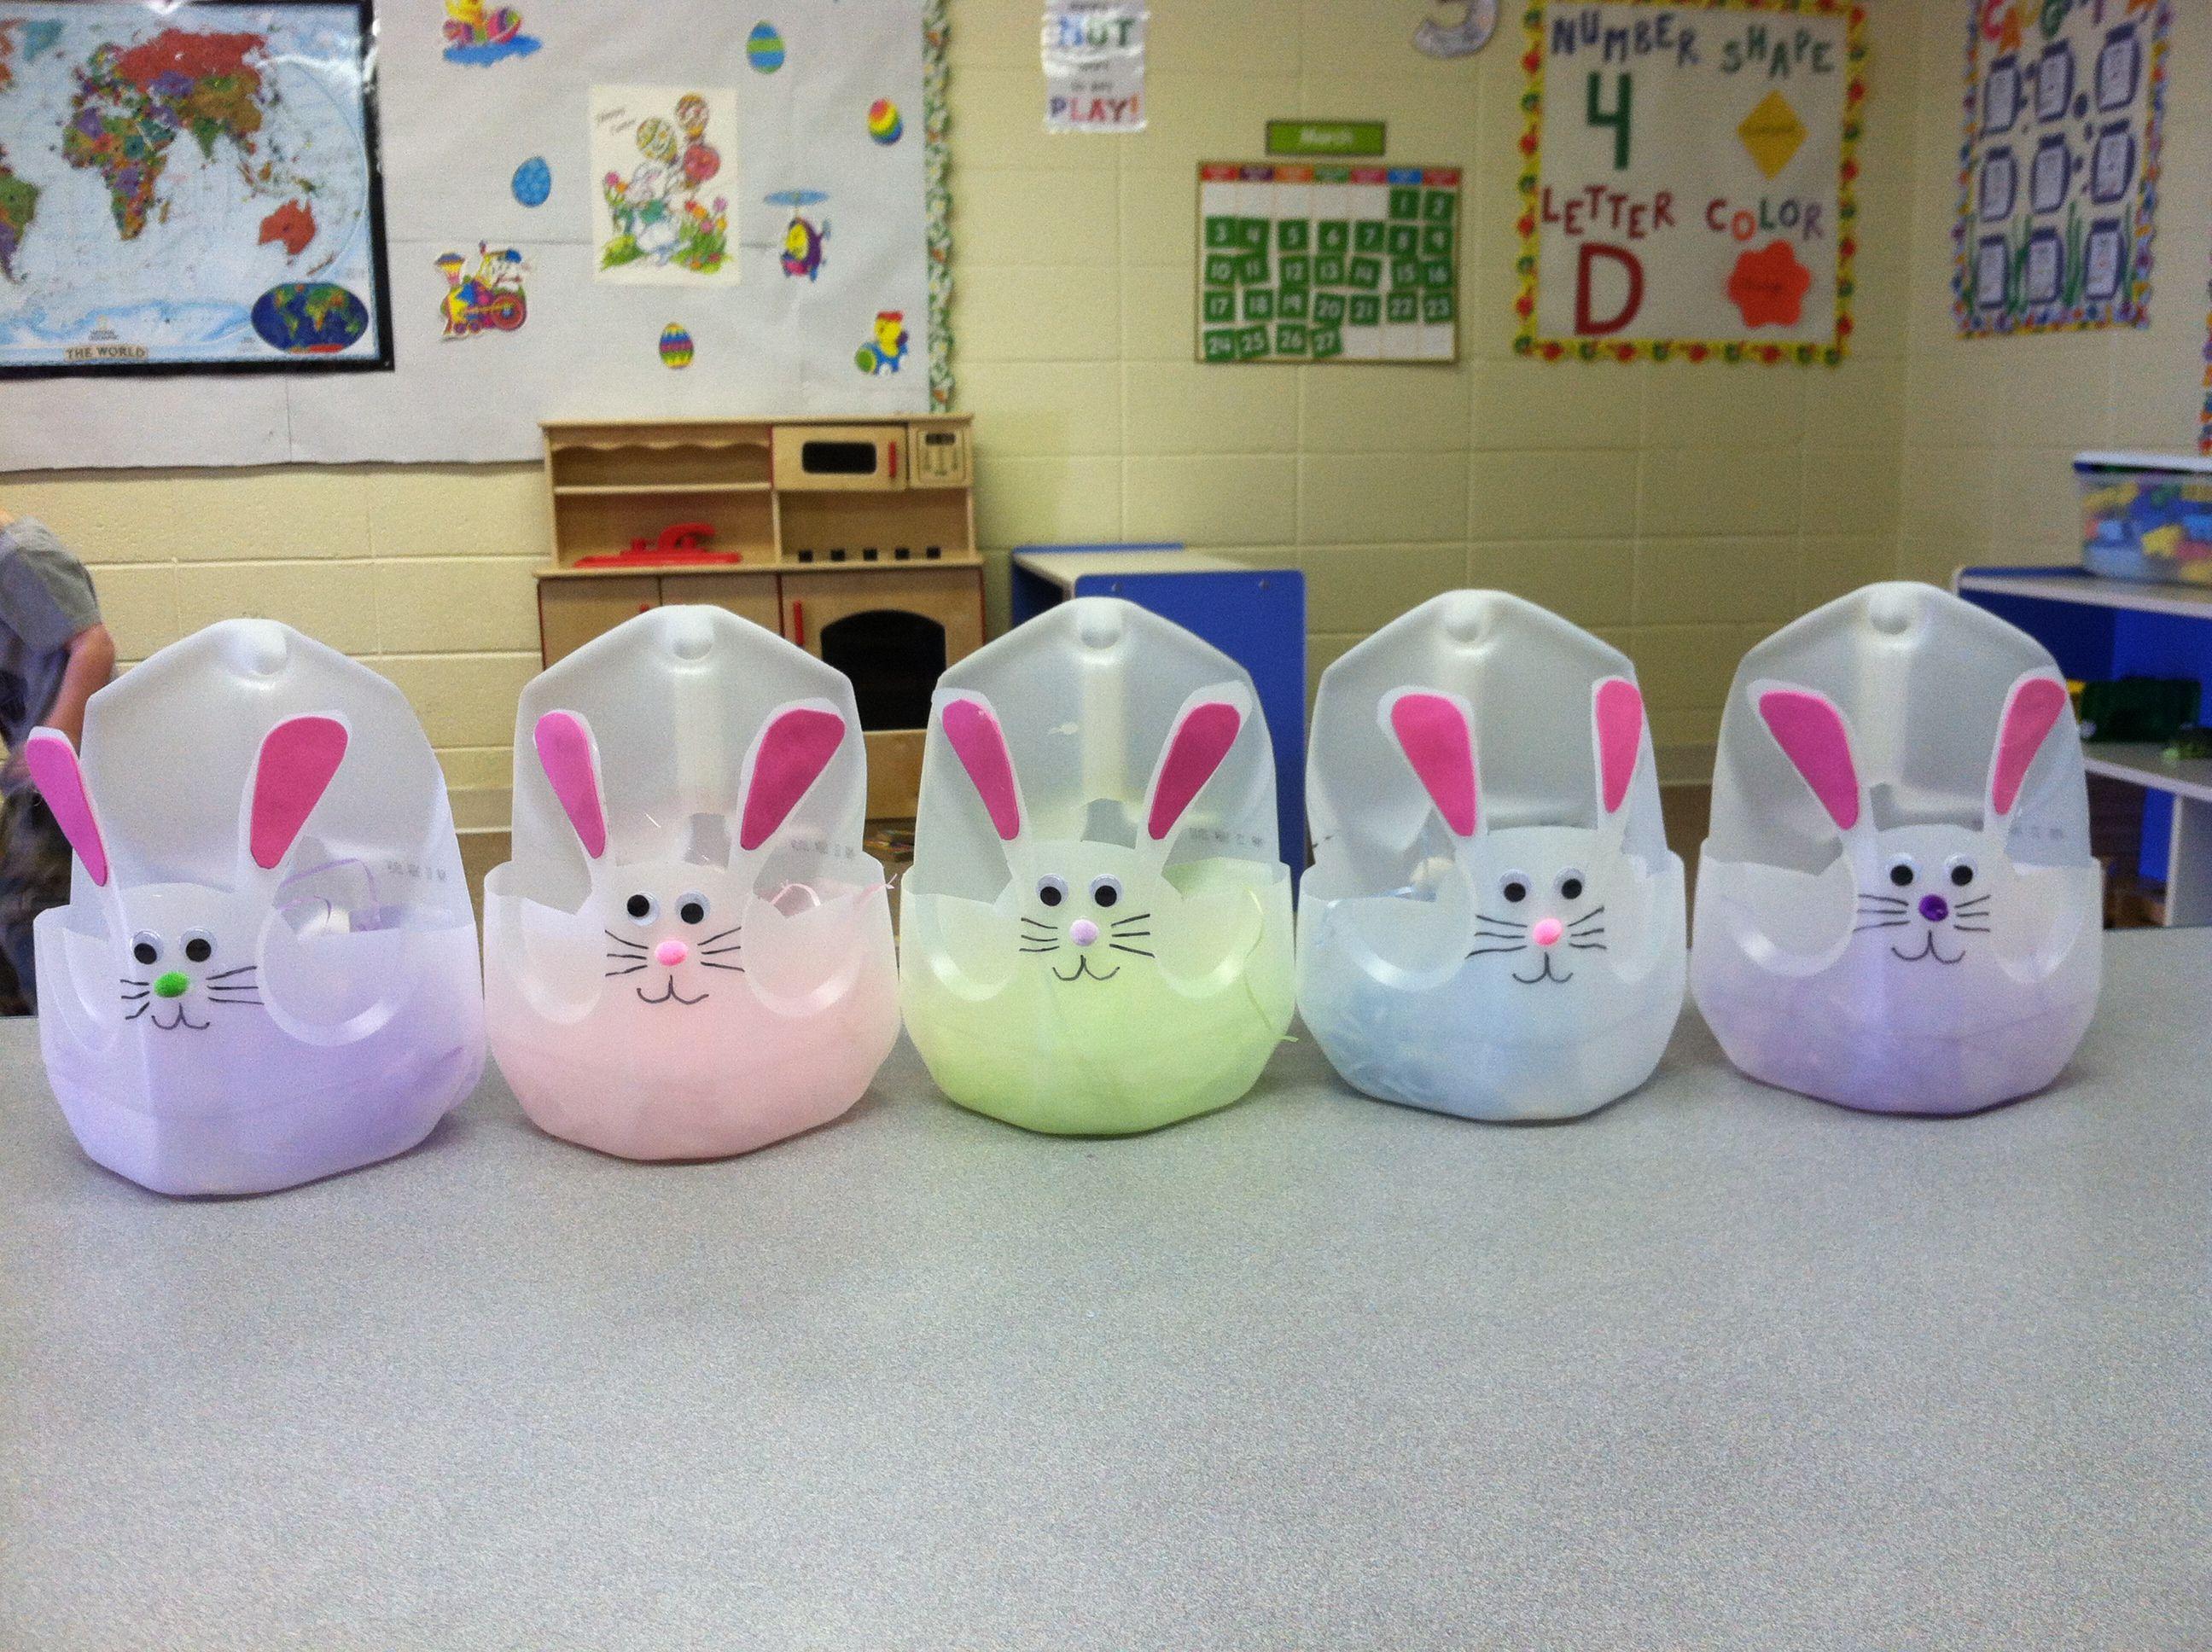 Preschool Art Easter Basket : Easter baskets my toddlers made in preschool out of milk